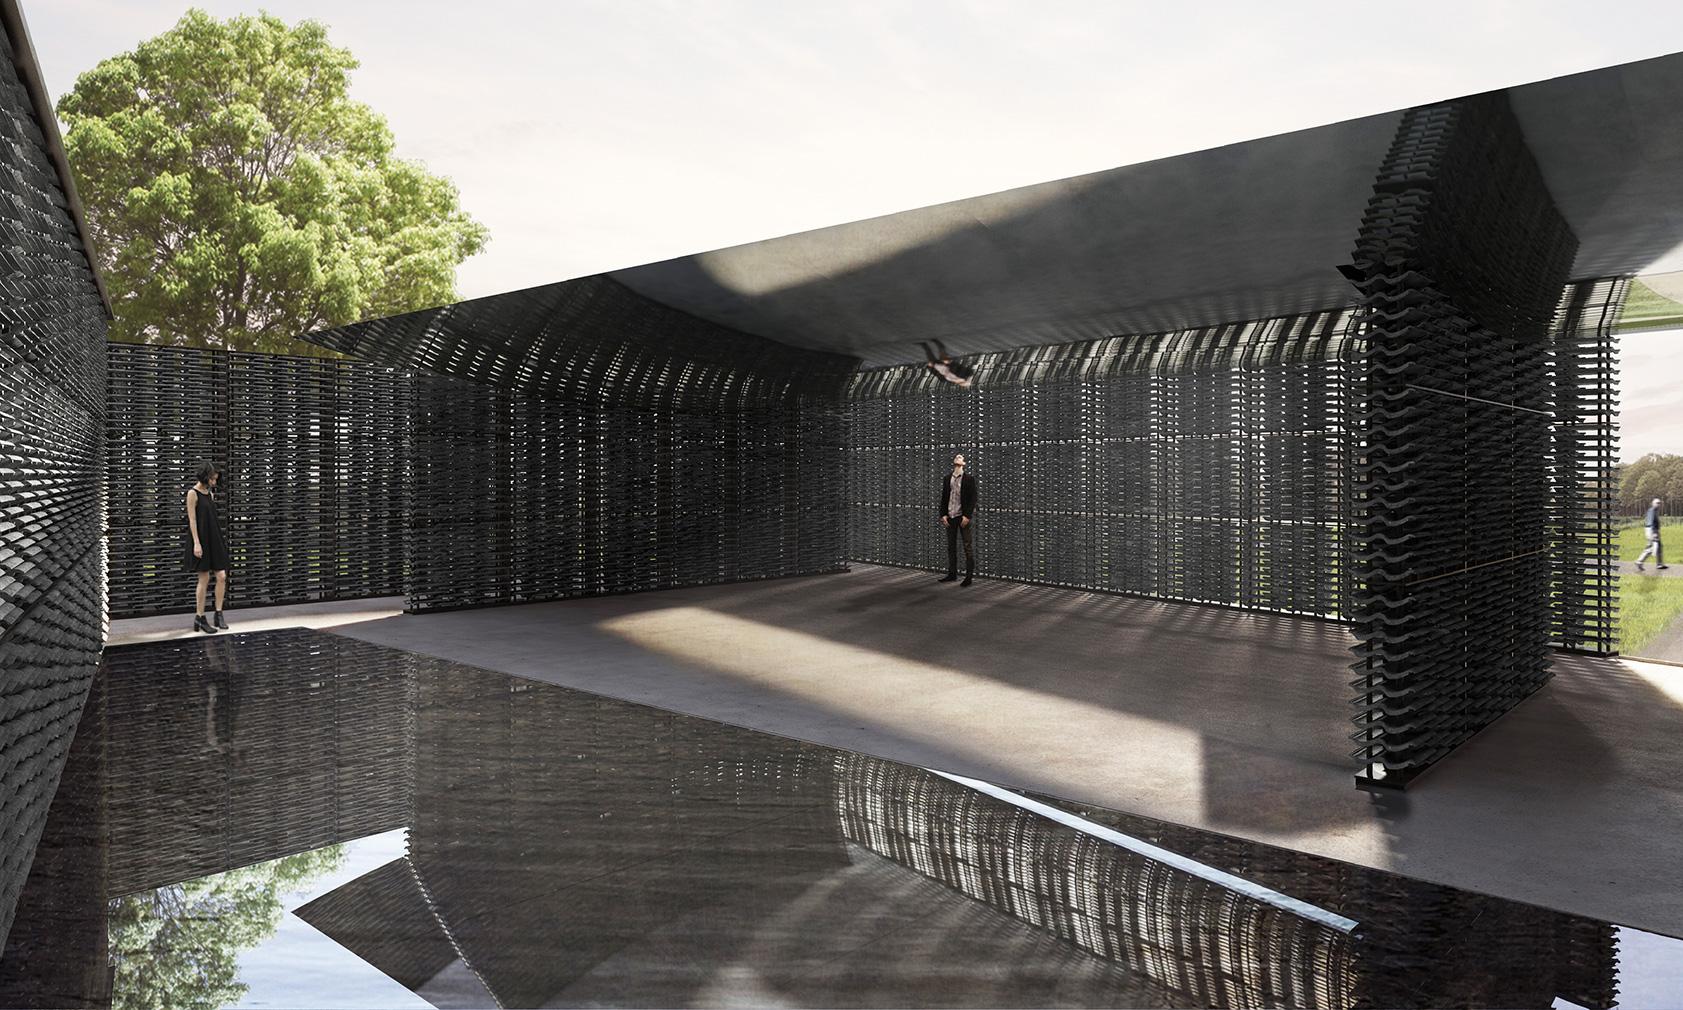 Serpentine Pavilion 2018 designed by Frida Escobedo, Taller de Arquitectura, interior view © Frida